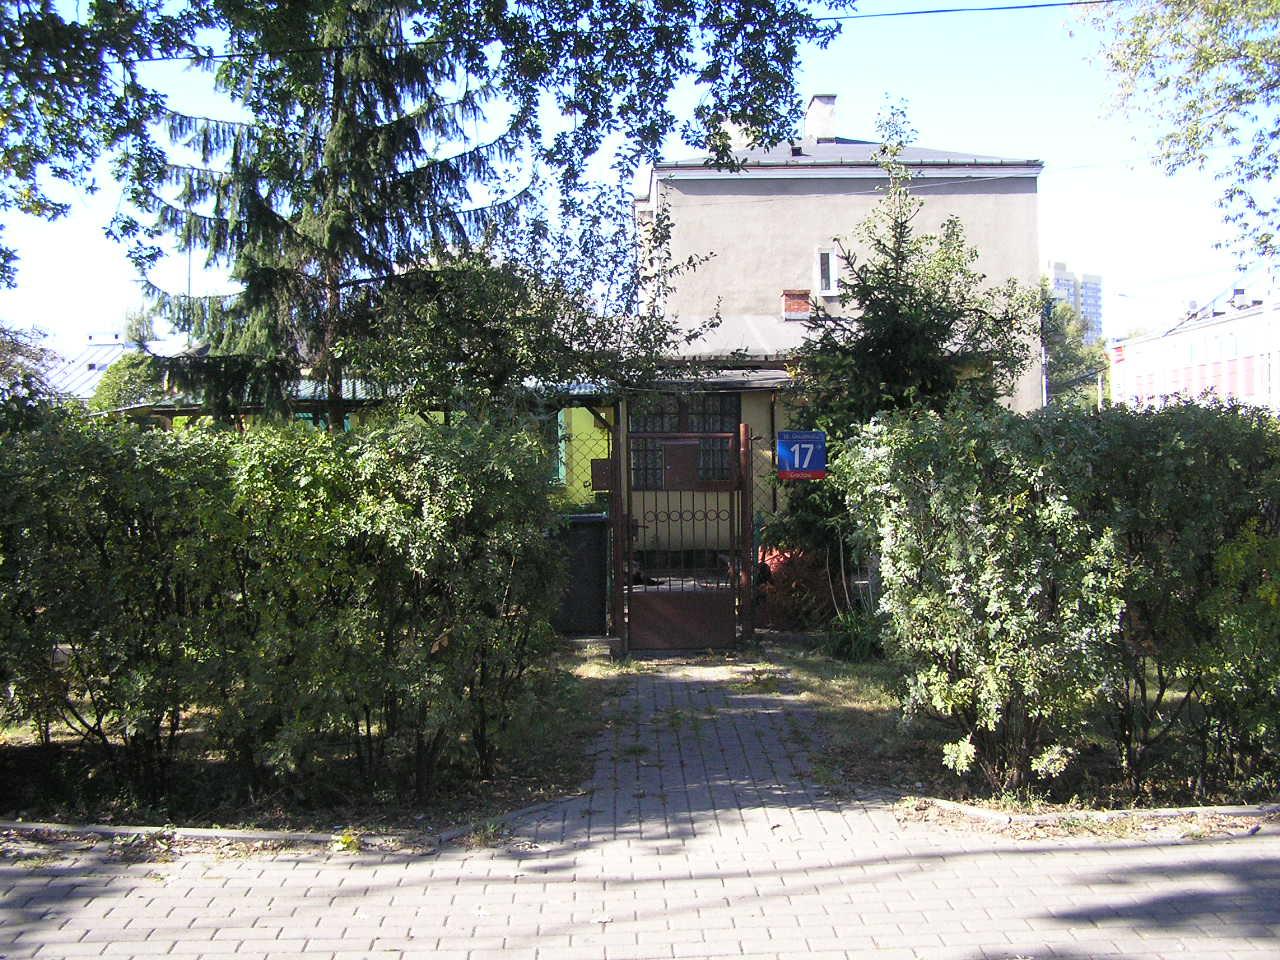 Omulewska 17